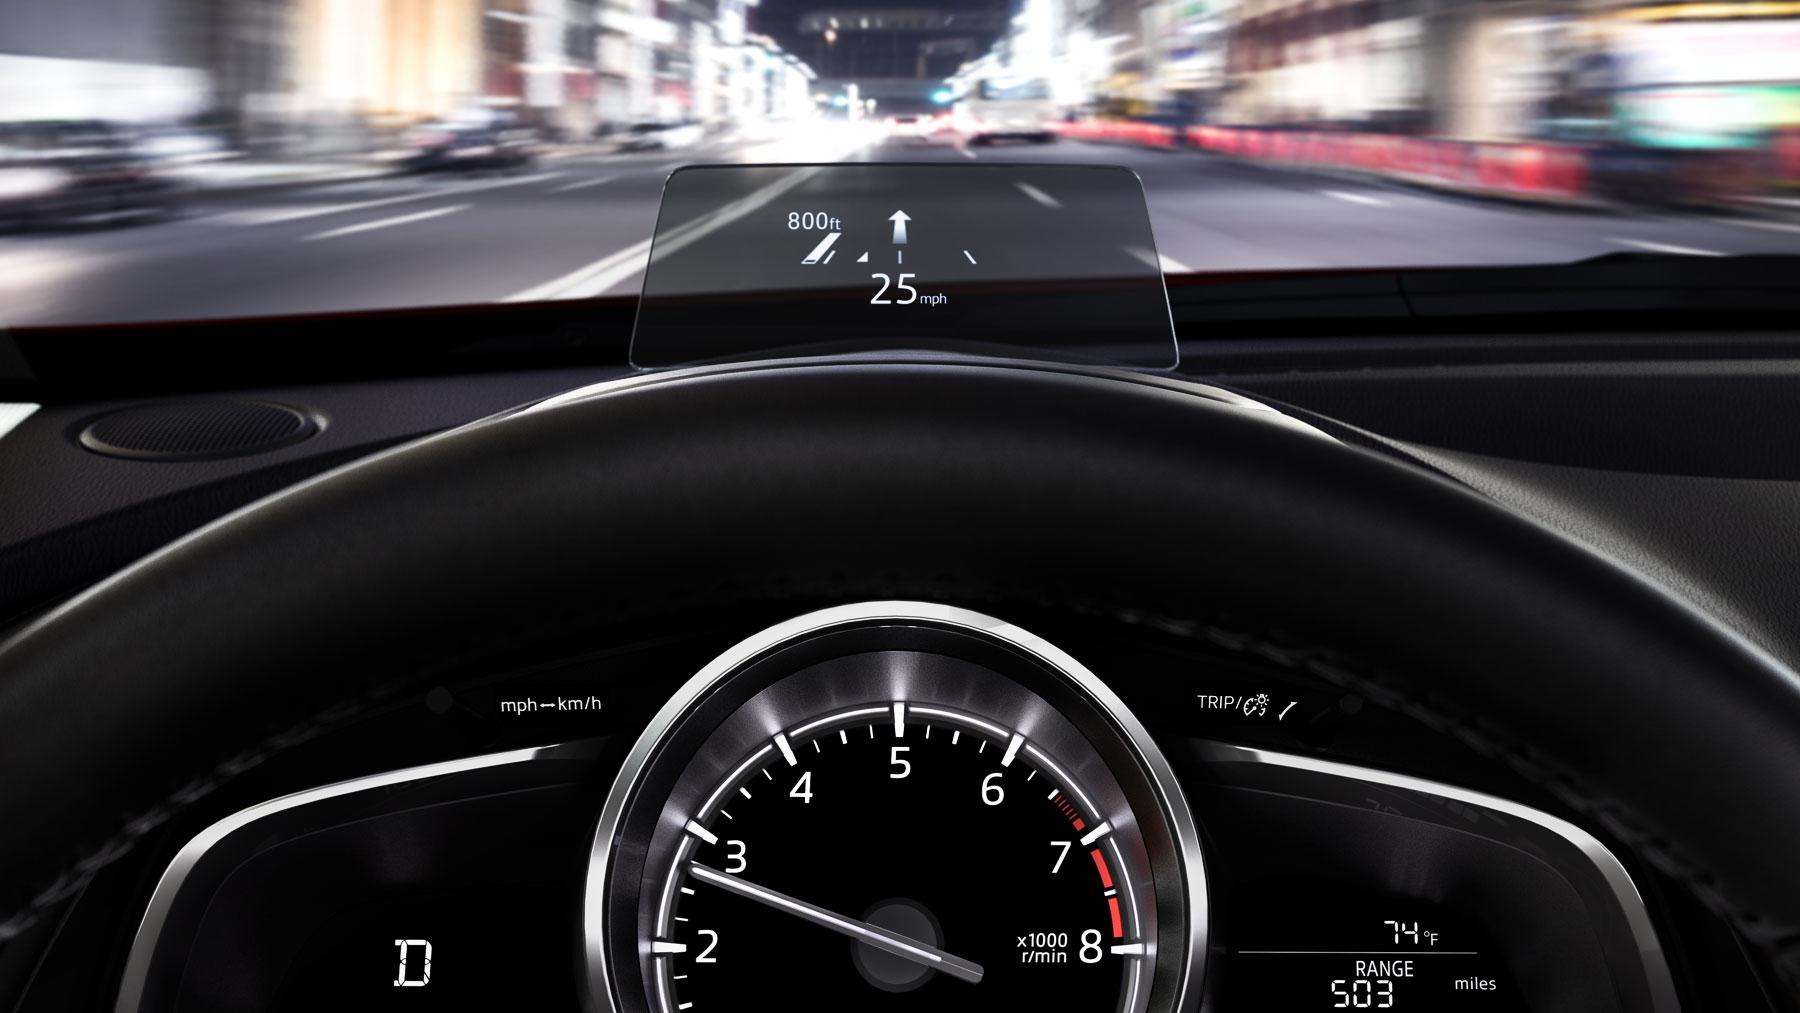 Mazda Build And Price >> 2018 Mazda CX-3 Crossover - View Pictures & Videos | Mazda USA